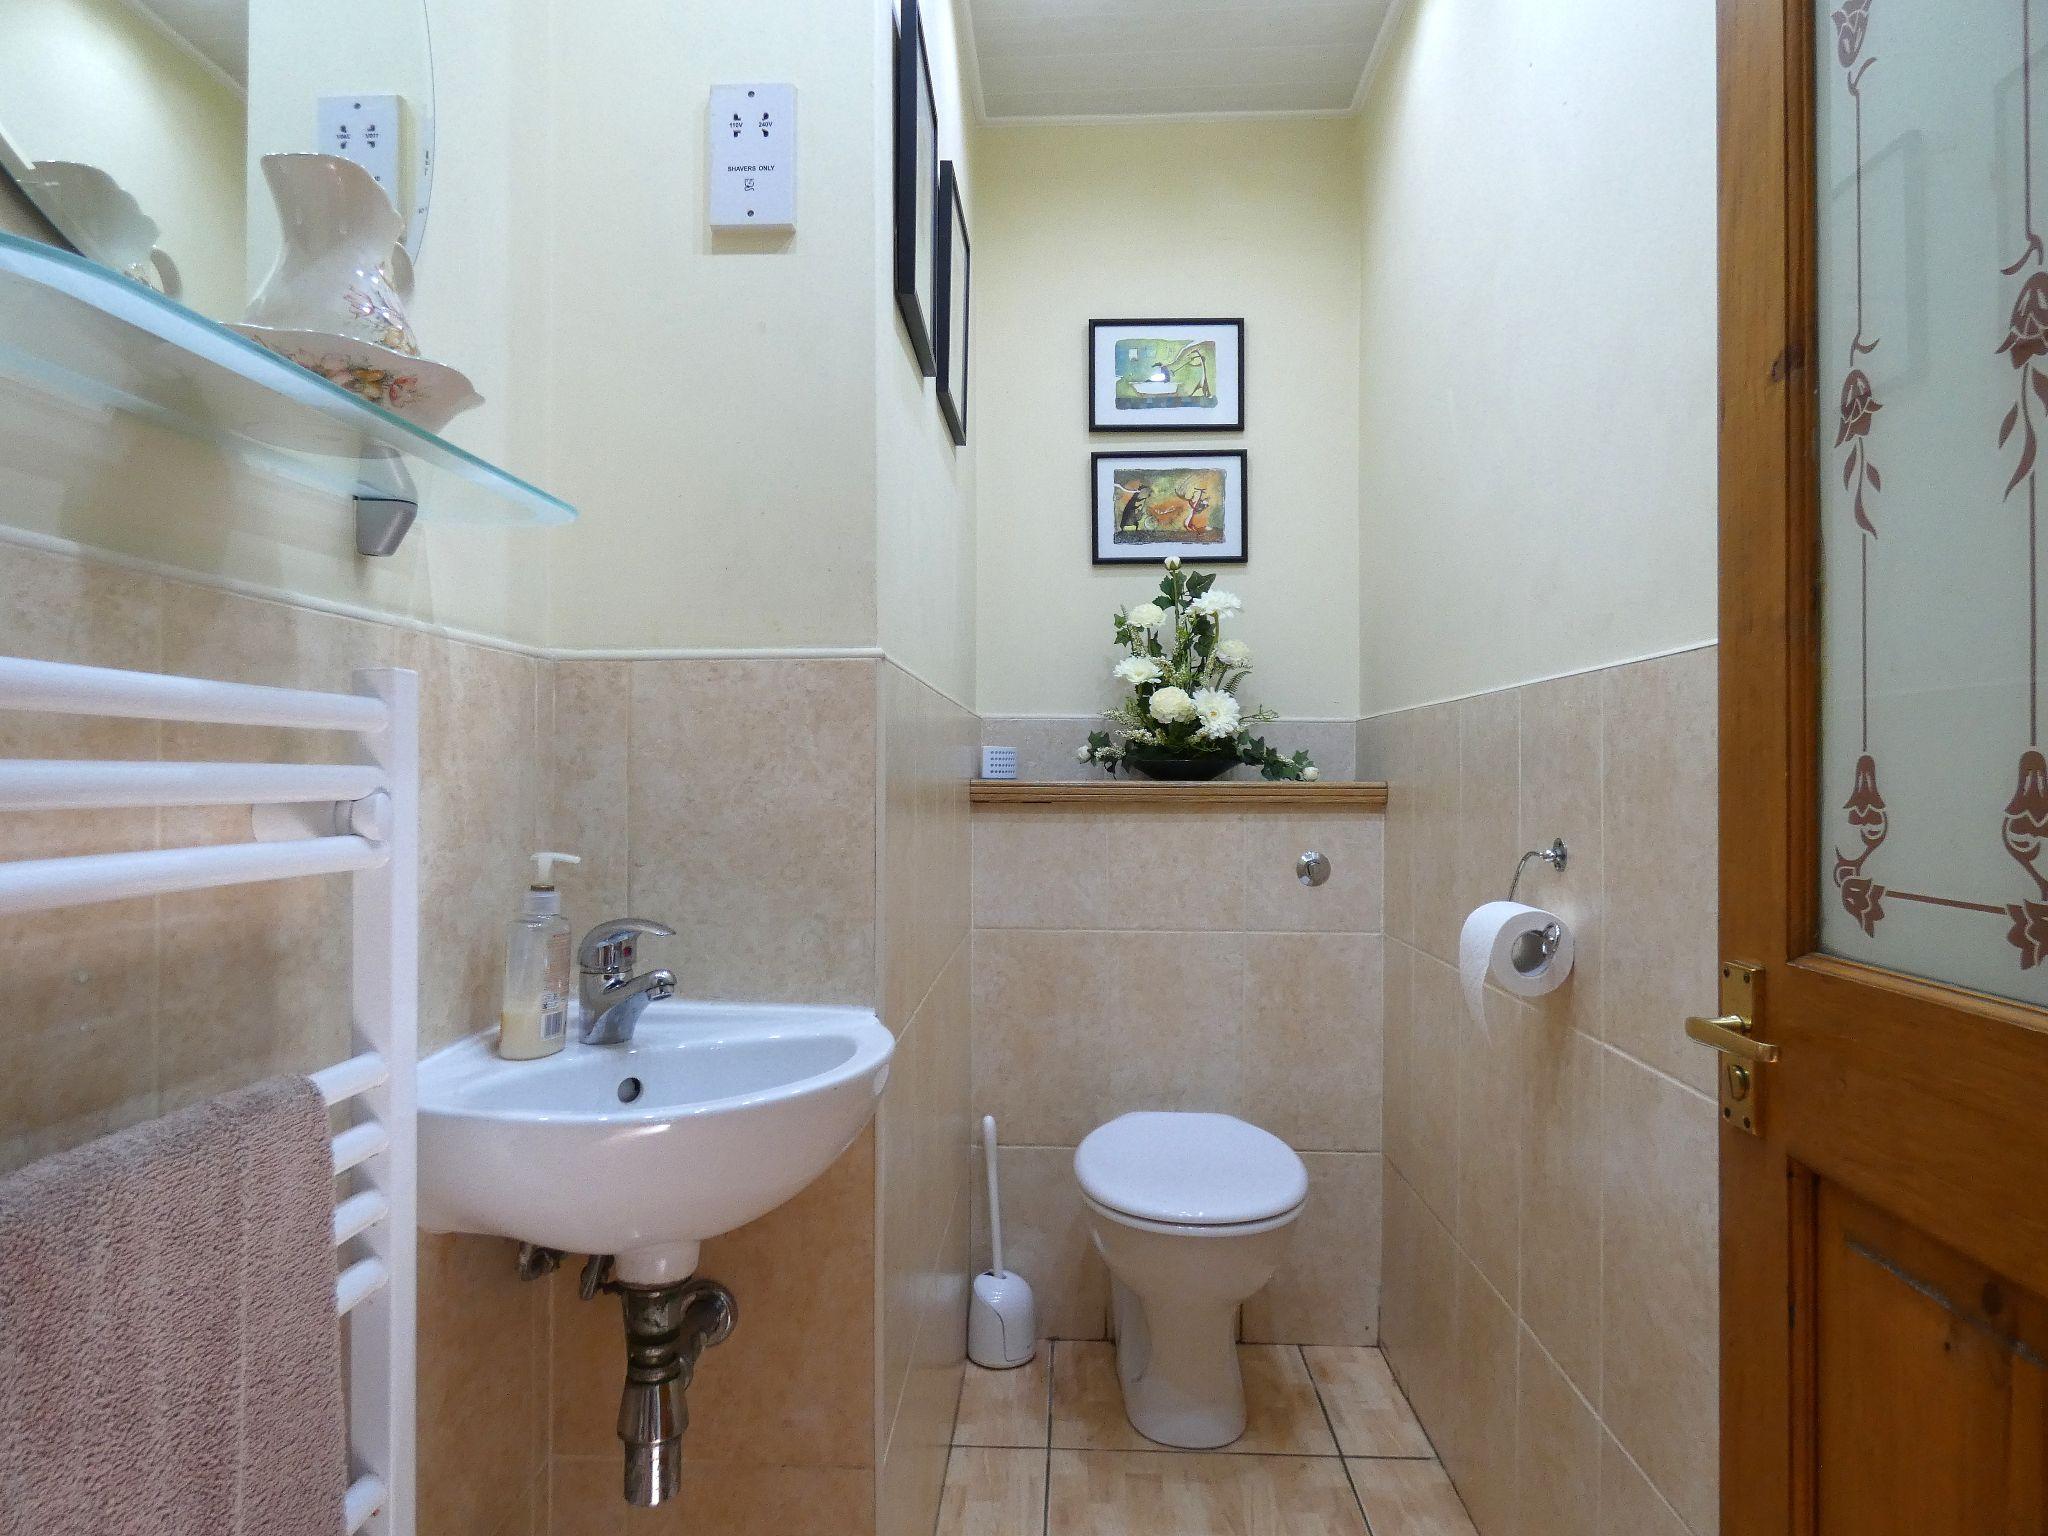 5 bedroom semi-detached house For Sale in Bishop Auckland - Ground Floor Cloakroom/Wc.